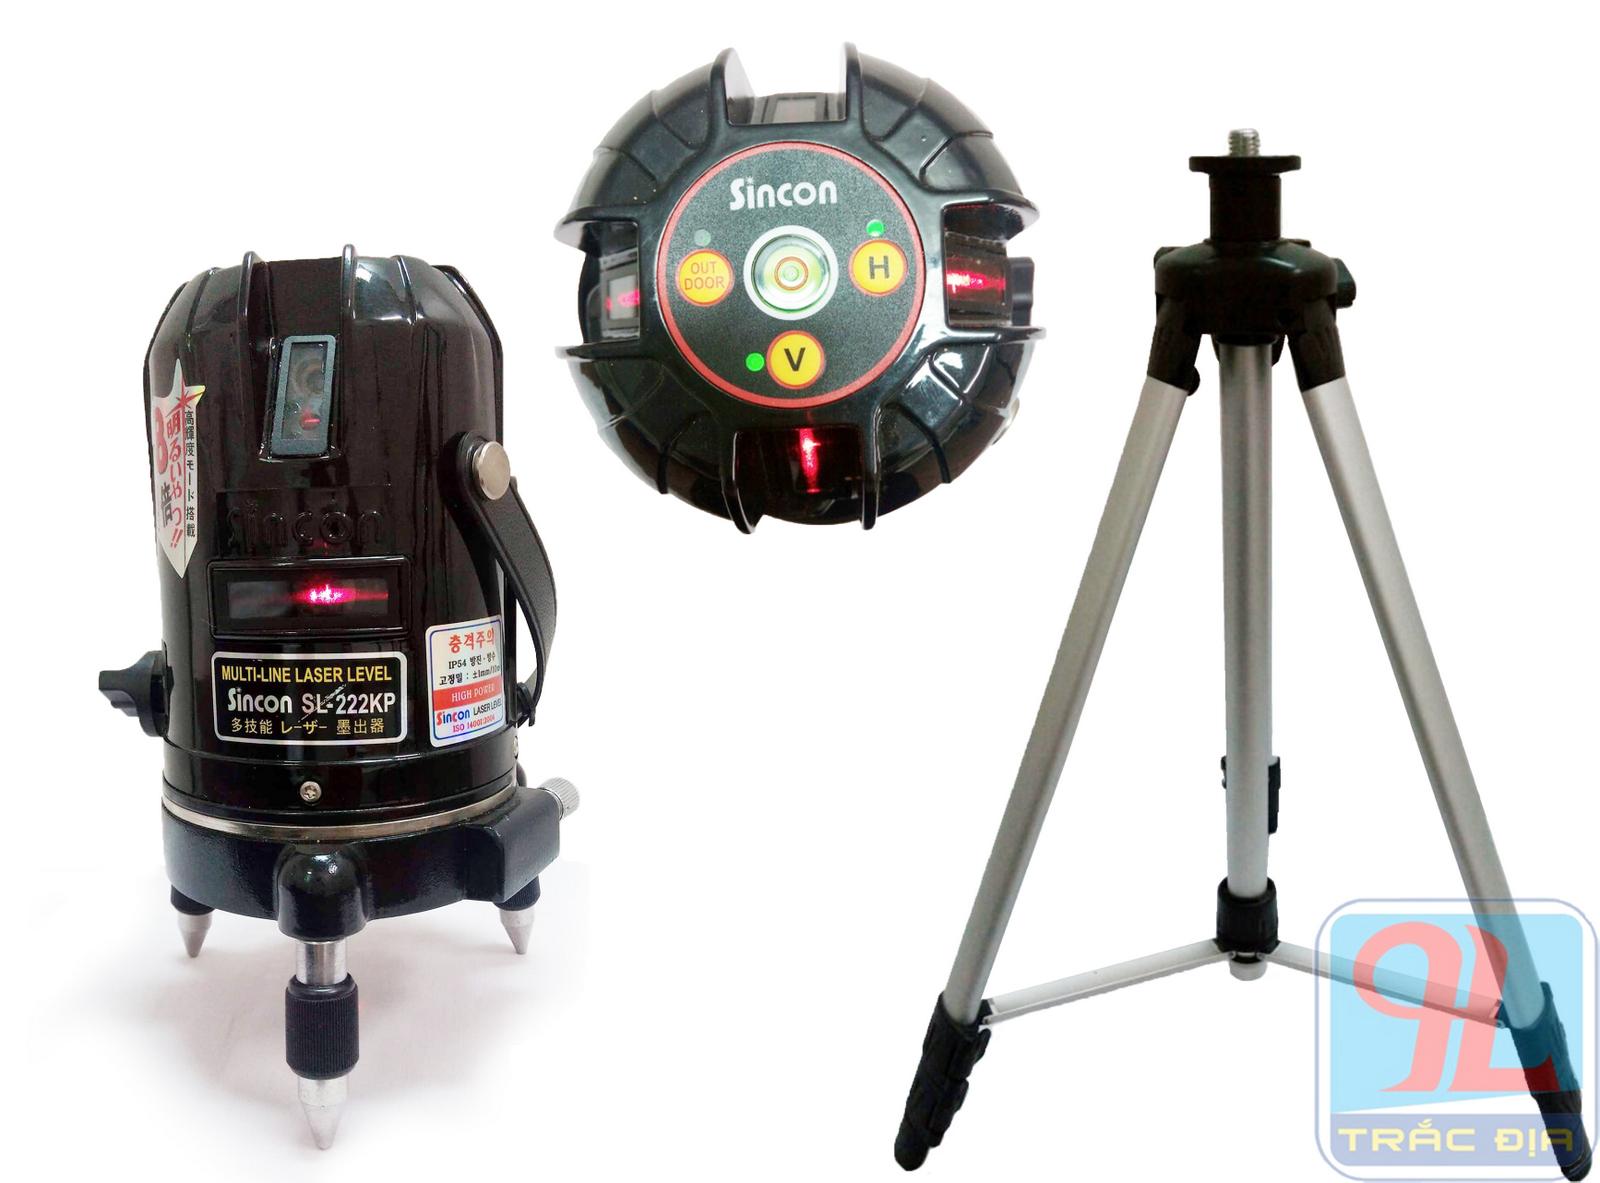 máy thủy bình laser sincon sl 222KP